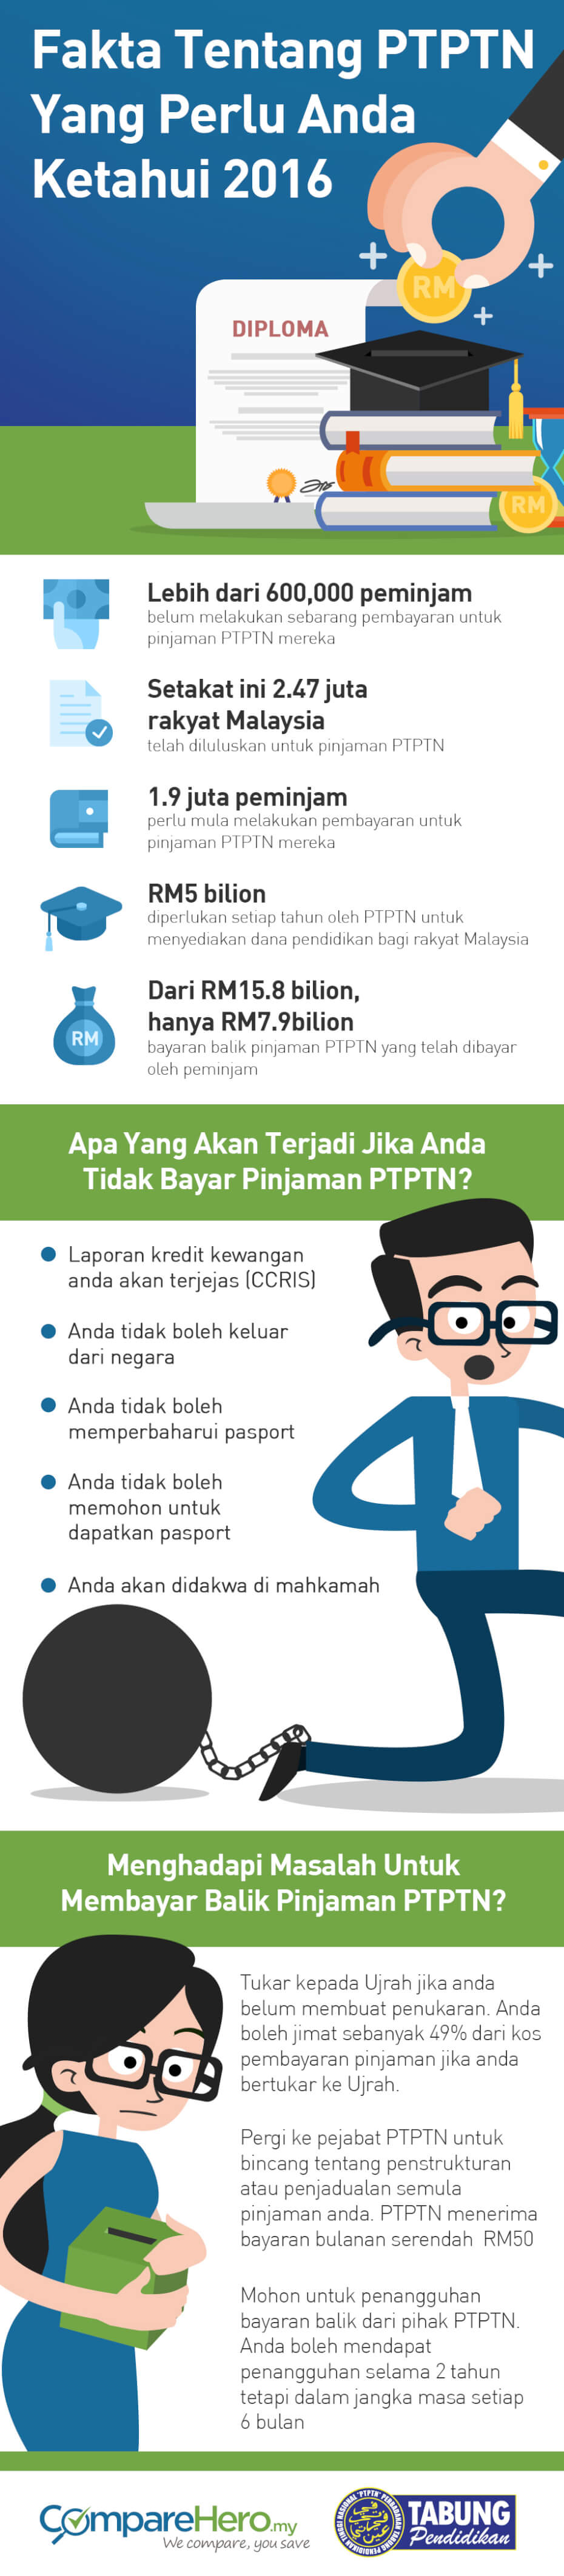 Bayaran balik pinjaman PTPTN